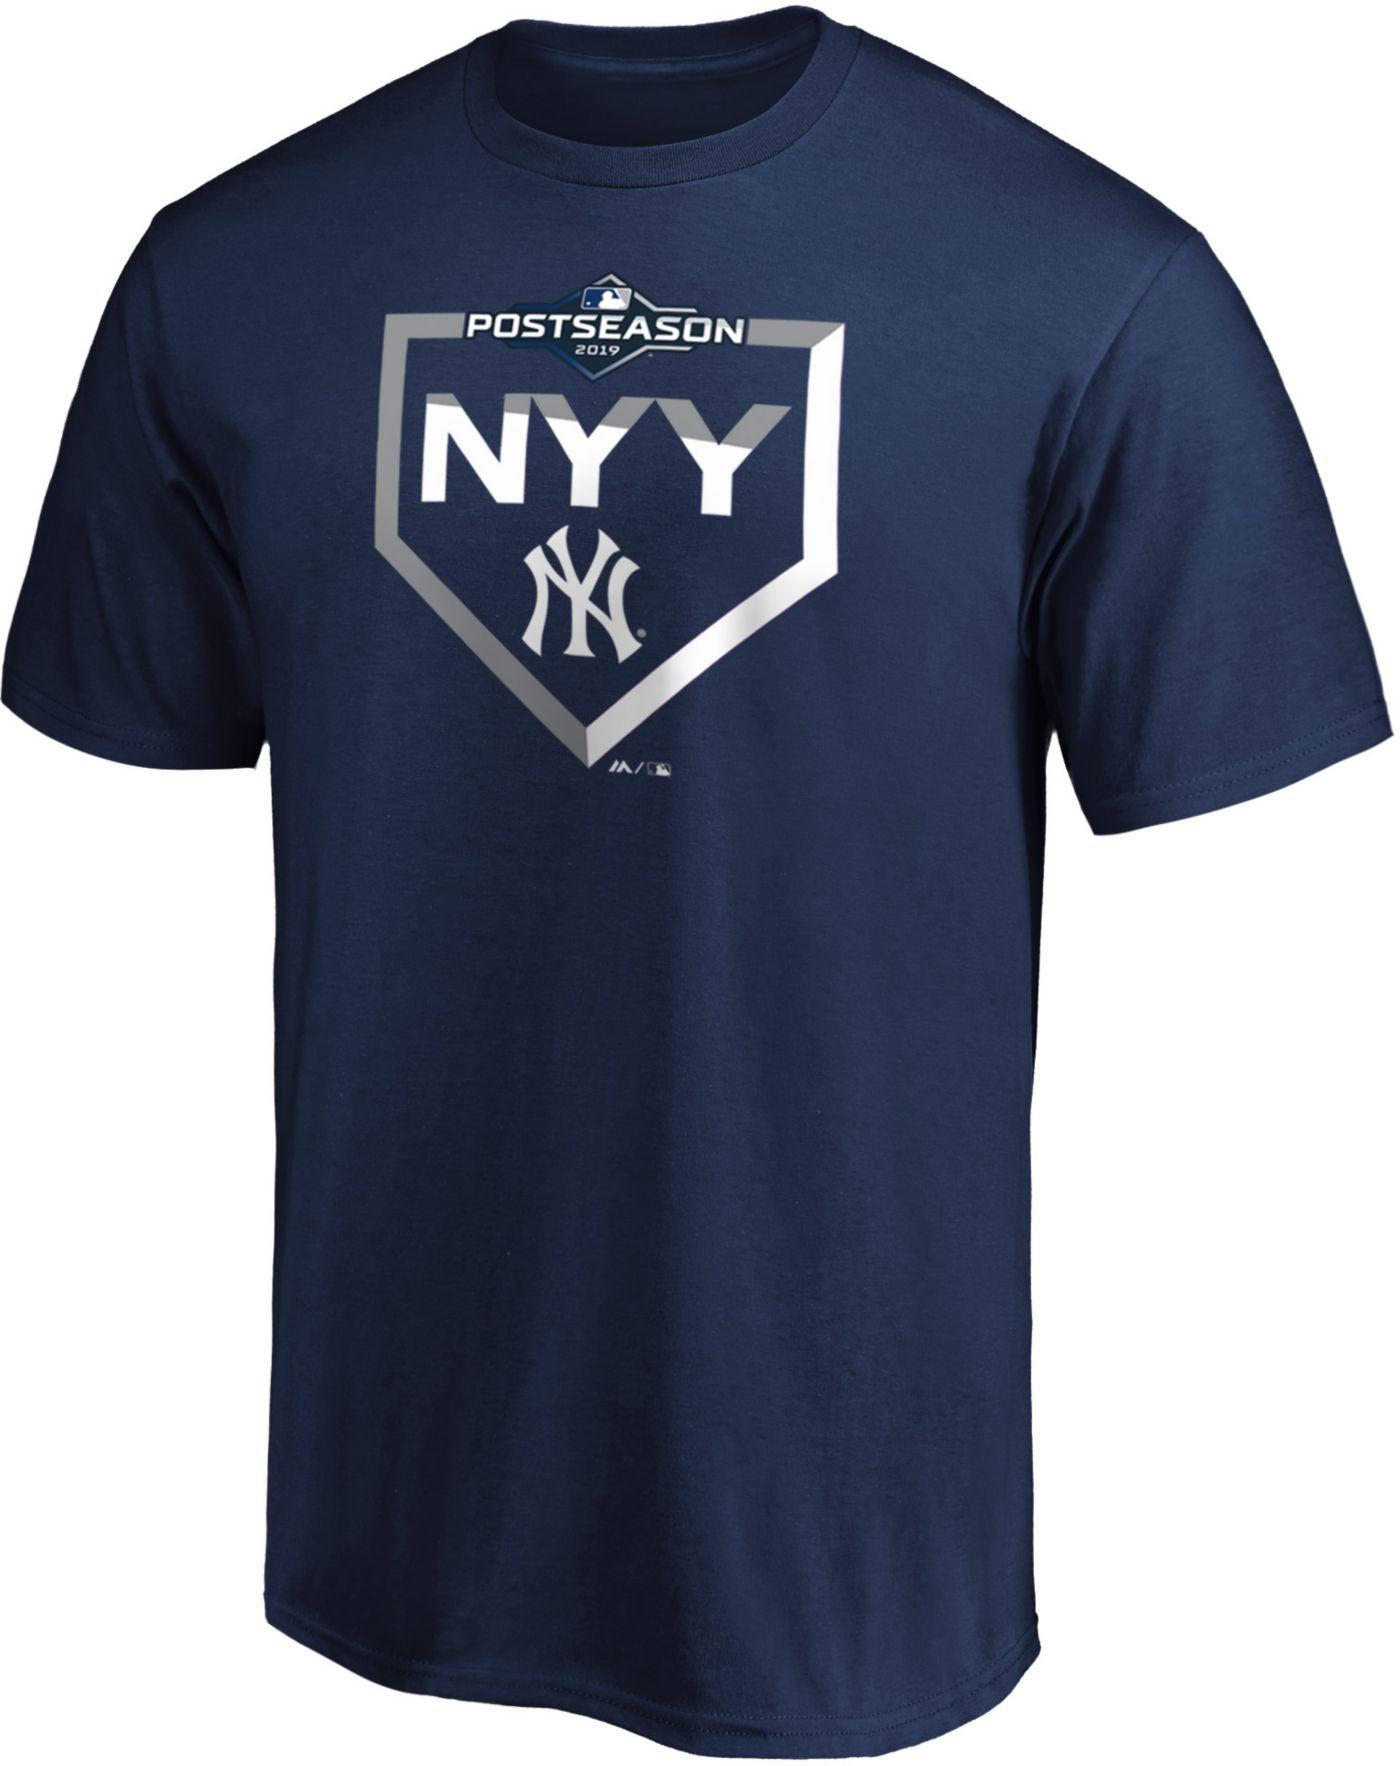 Majestic Men's New York Yankees 2019 MLB Postseason T-Shirt